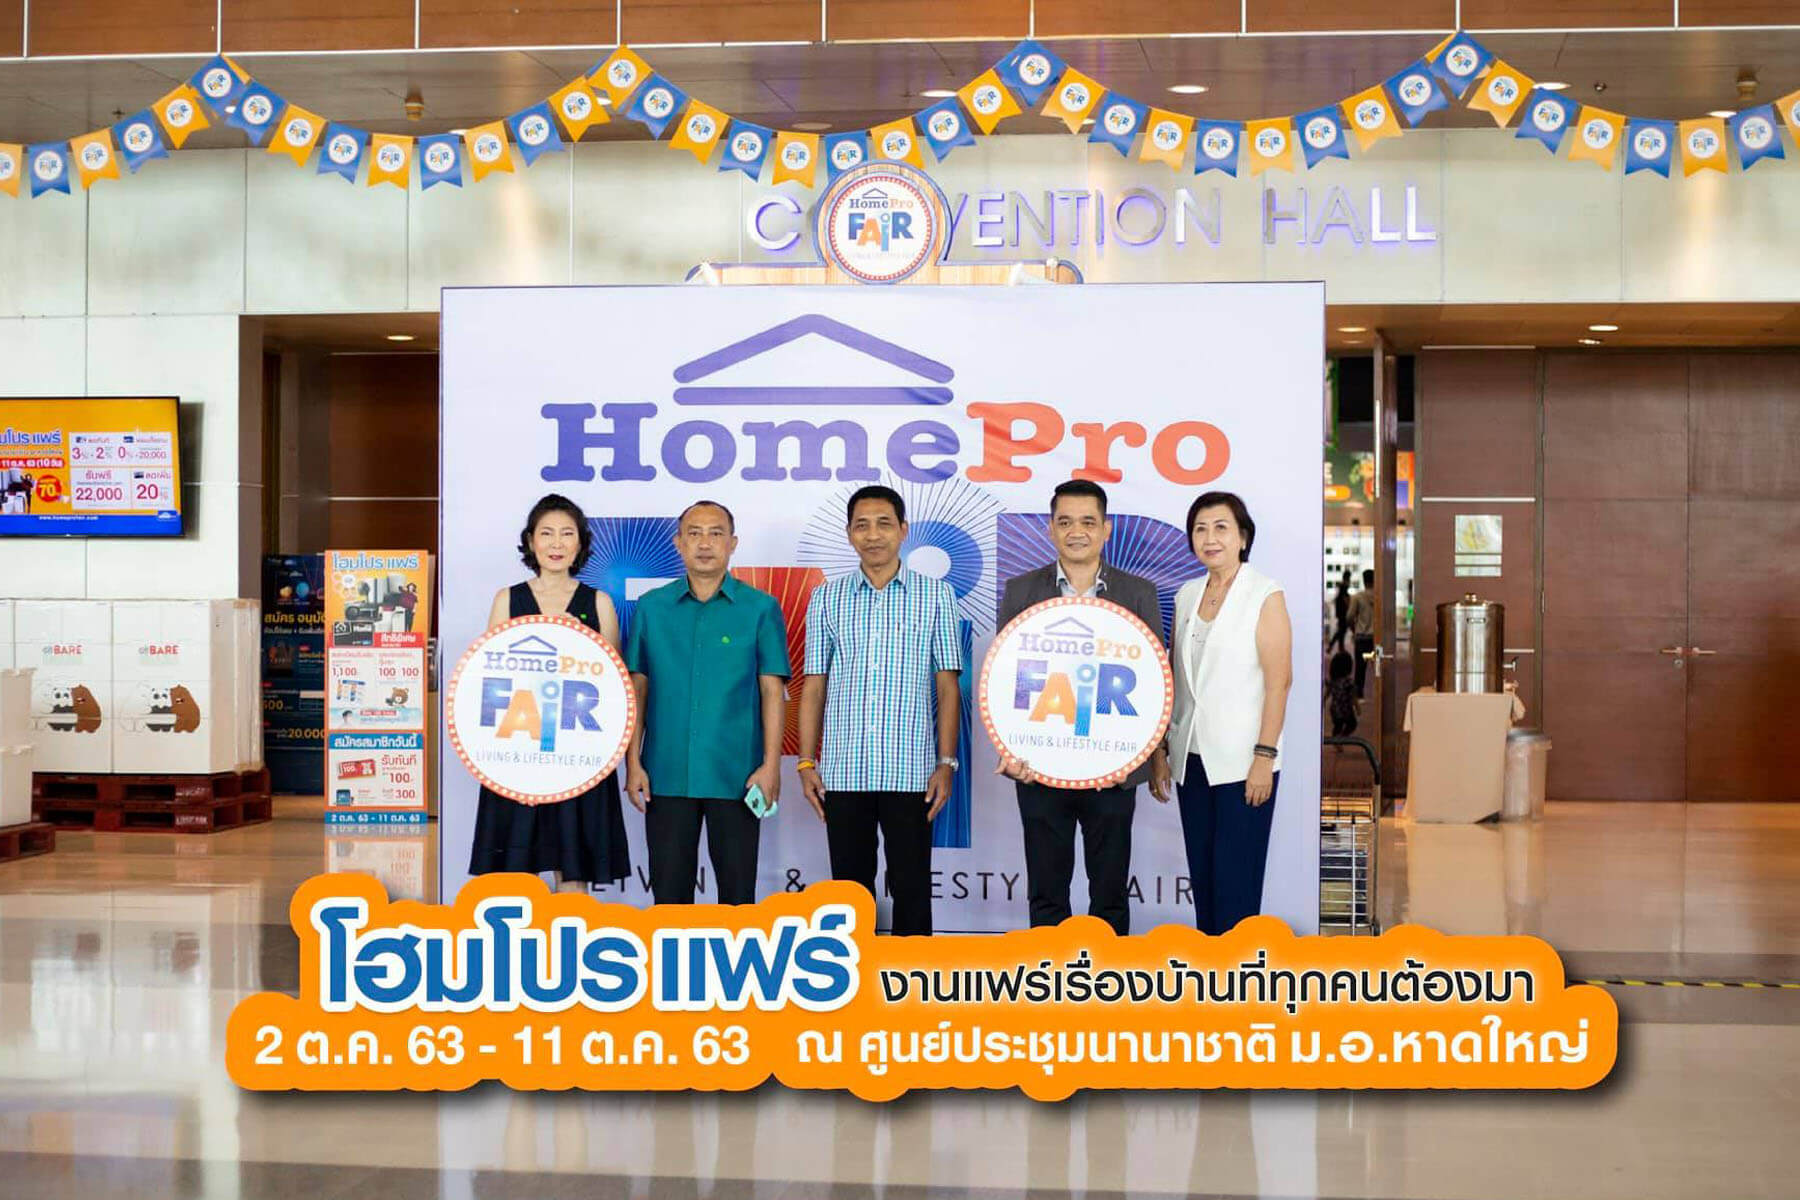 Homepro Fair 2020 ICC HATYAI ศูนย์ประชุมนานาชาติฉลองสิริราชสมบัติครบ ๖๐ ปี